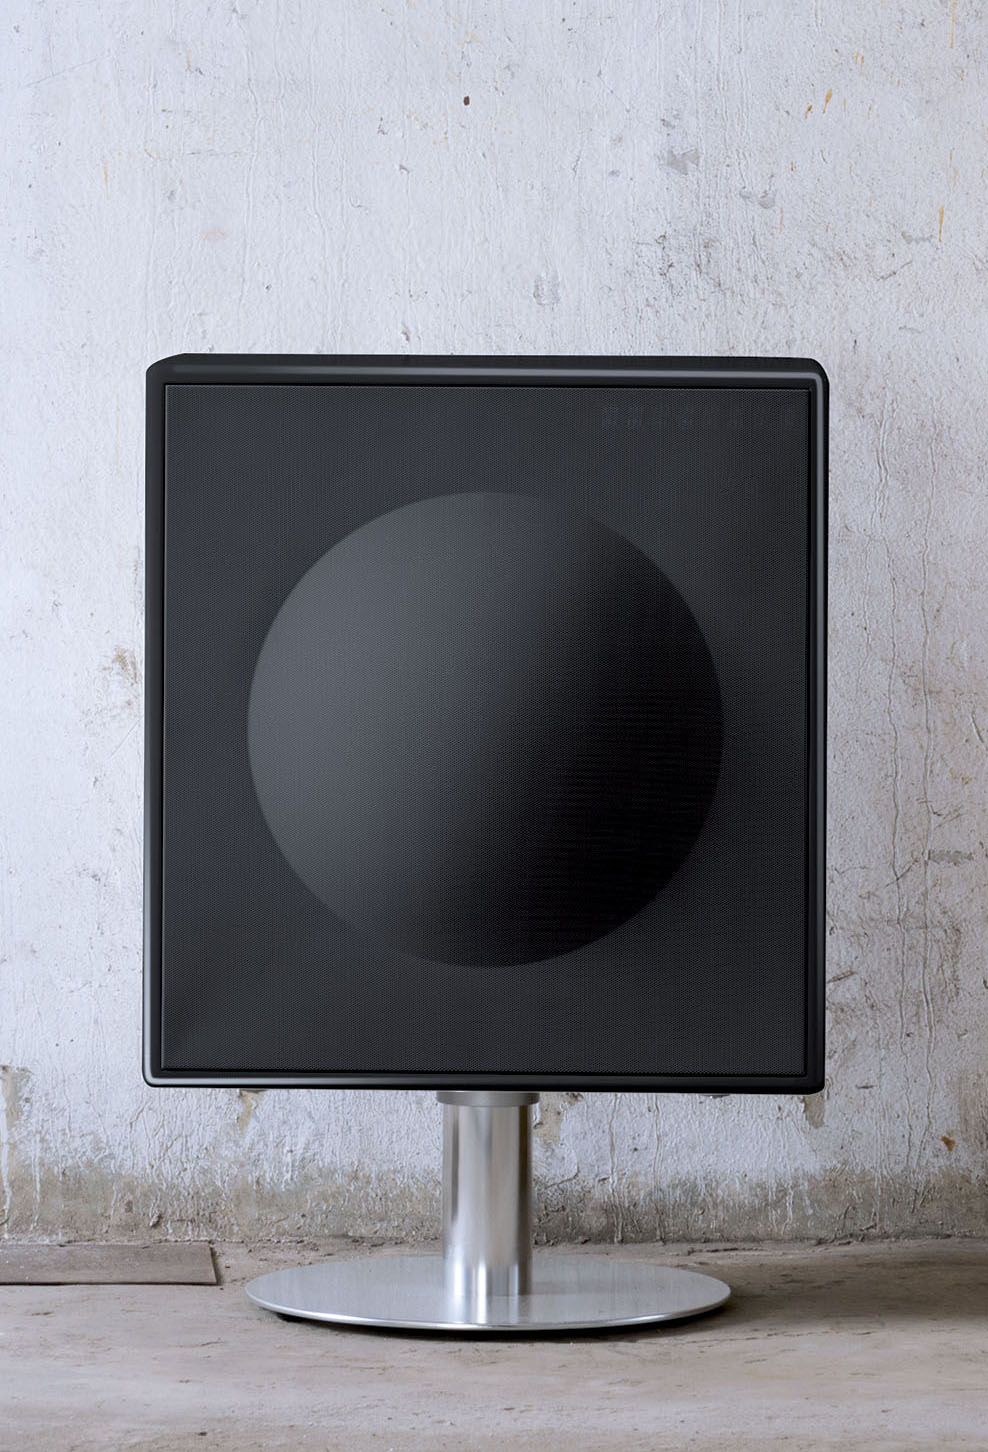 Model XL radical black